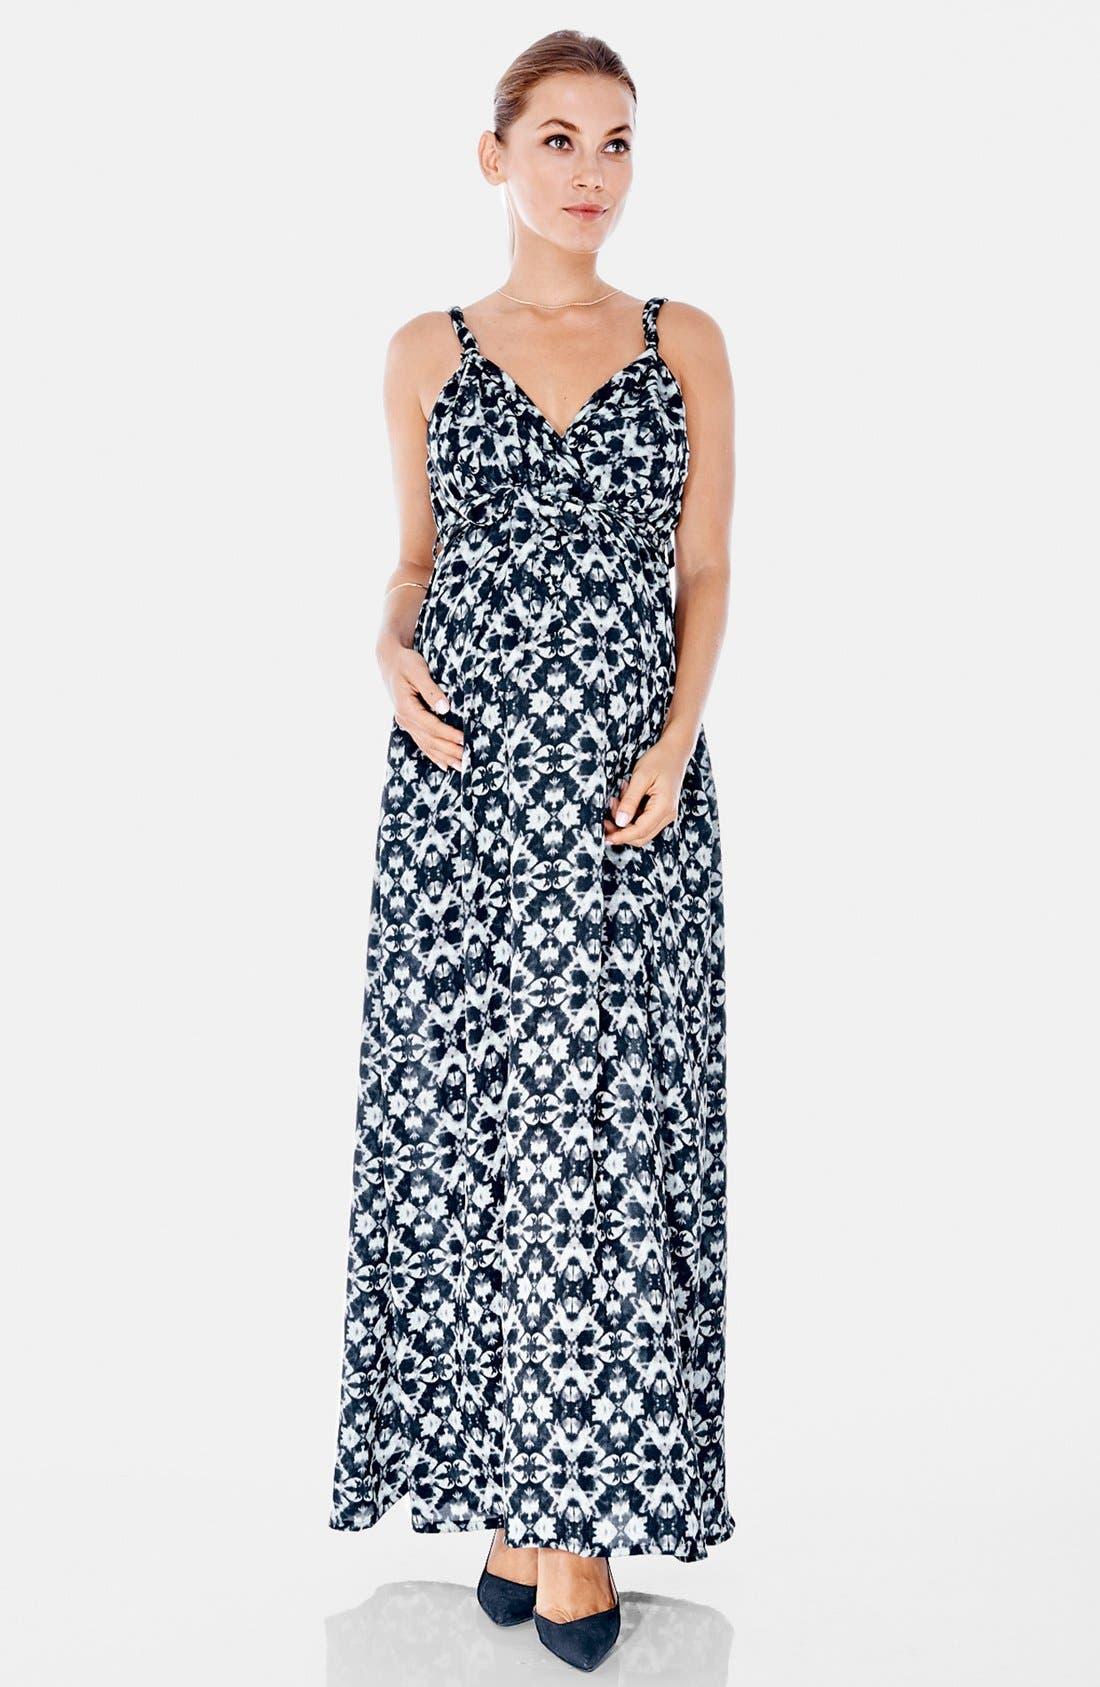 Main Image - Imanimo Maxi Maternity Dress